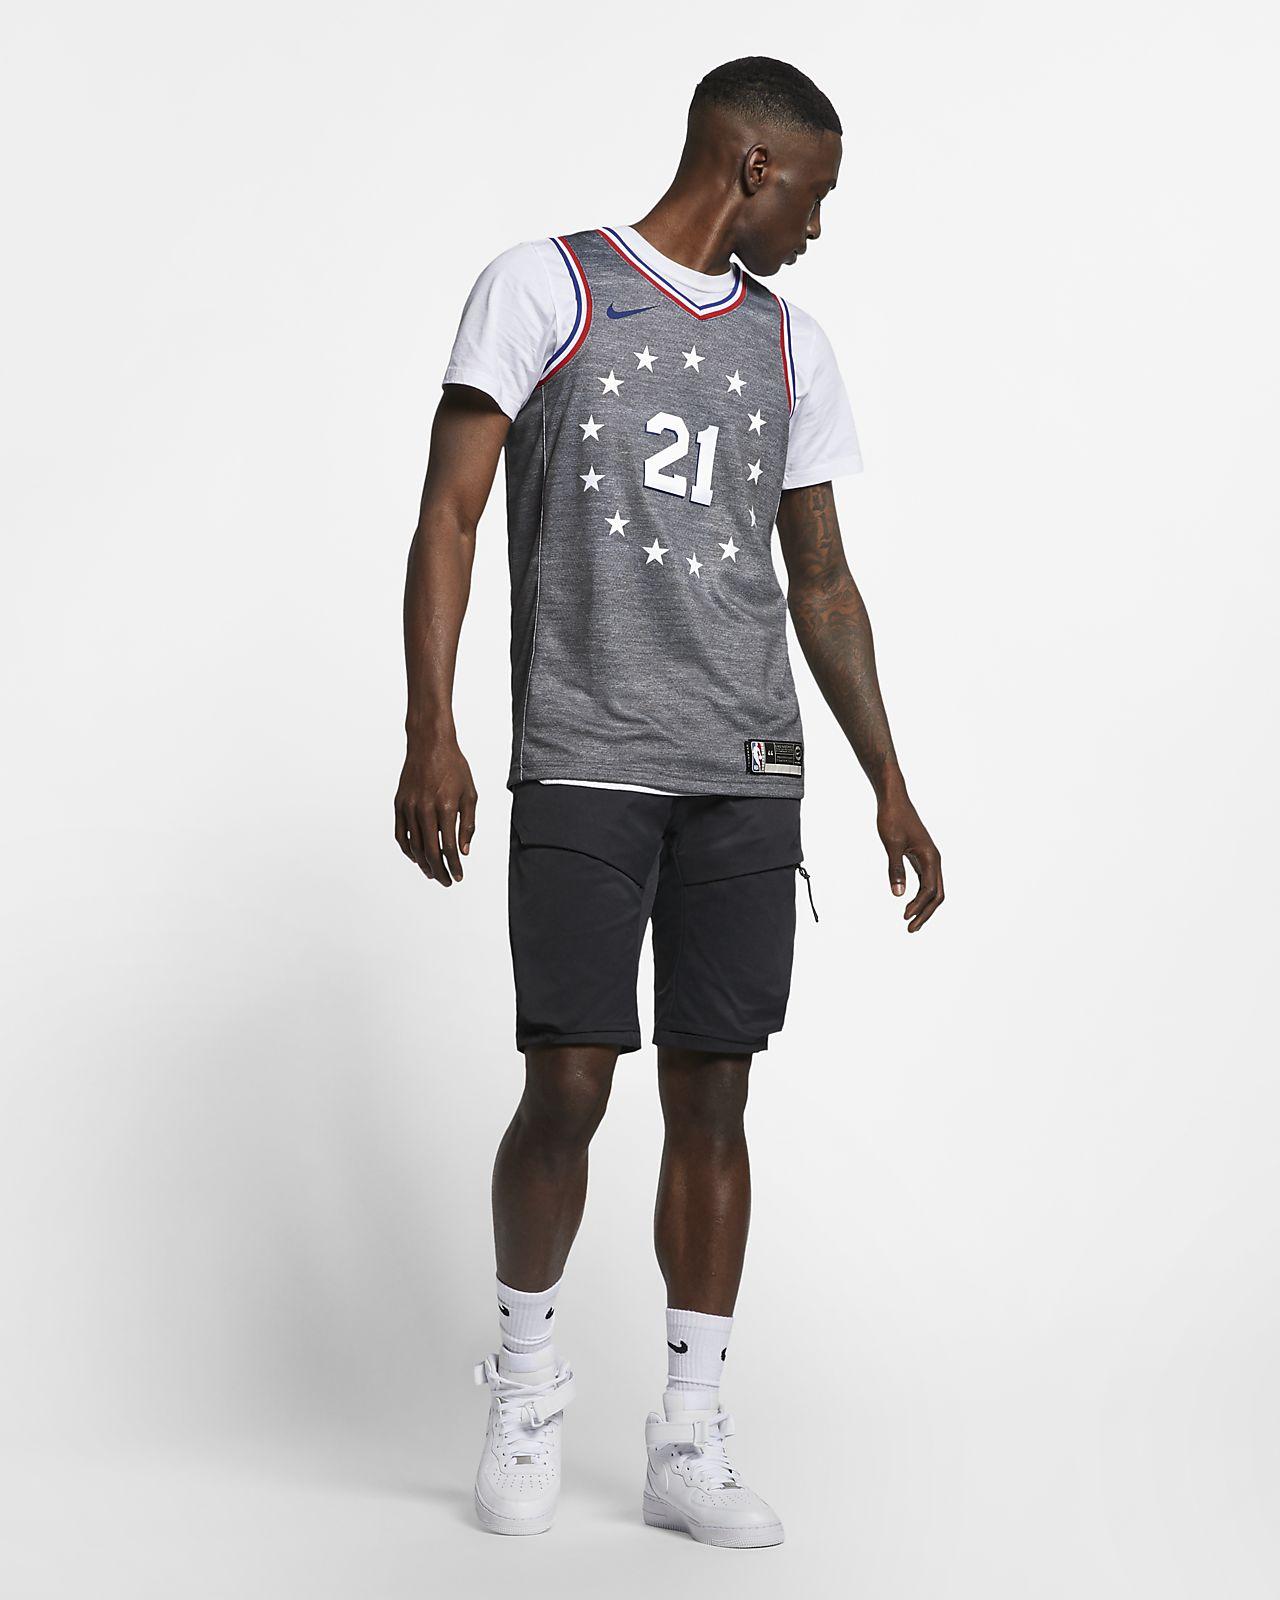 ba9f3e7b488 ... Camiseta conectada Nike NBA para hombre Joel Embiid City Edition  Swingman (Philadelphia 76ers)